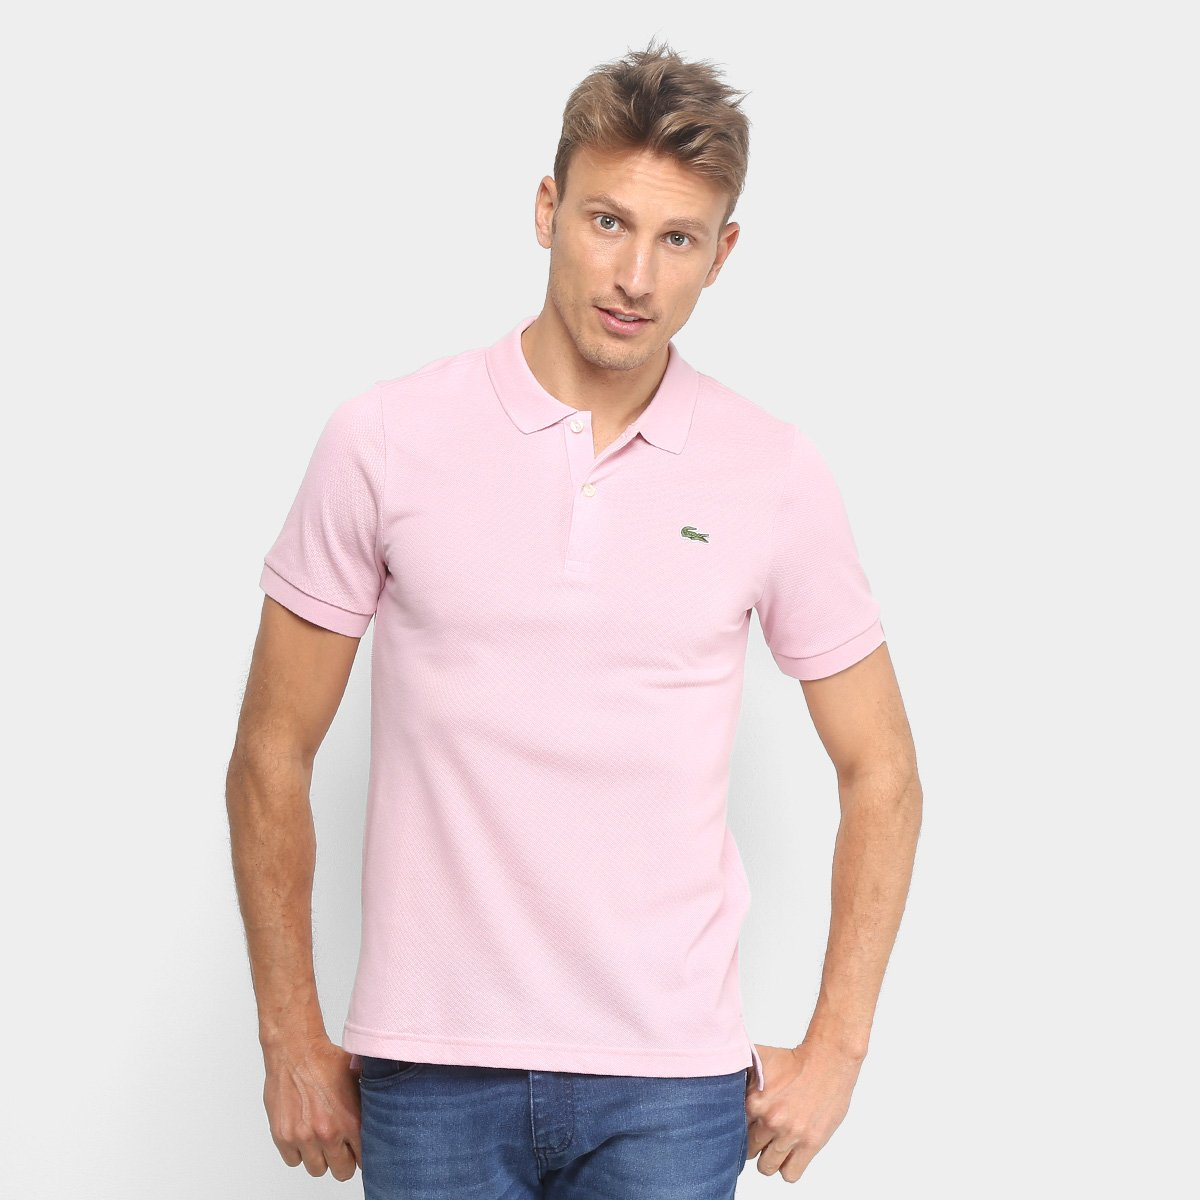 85c842f1ecc1f Camisa Polo Lacoste Live Piquet Masculina - Rosa Claro - Compre Agora